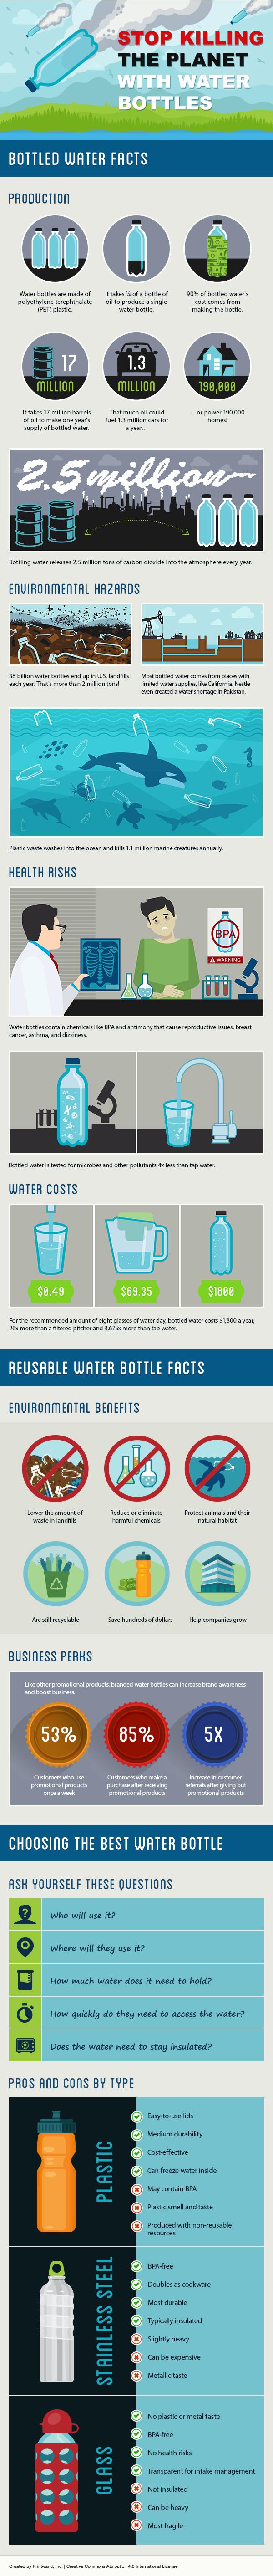 disposable water bottles